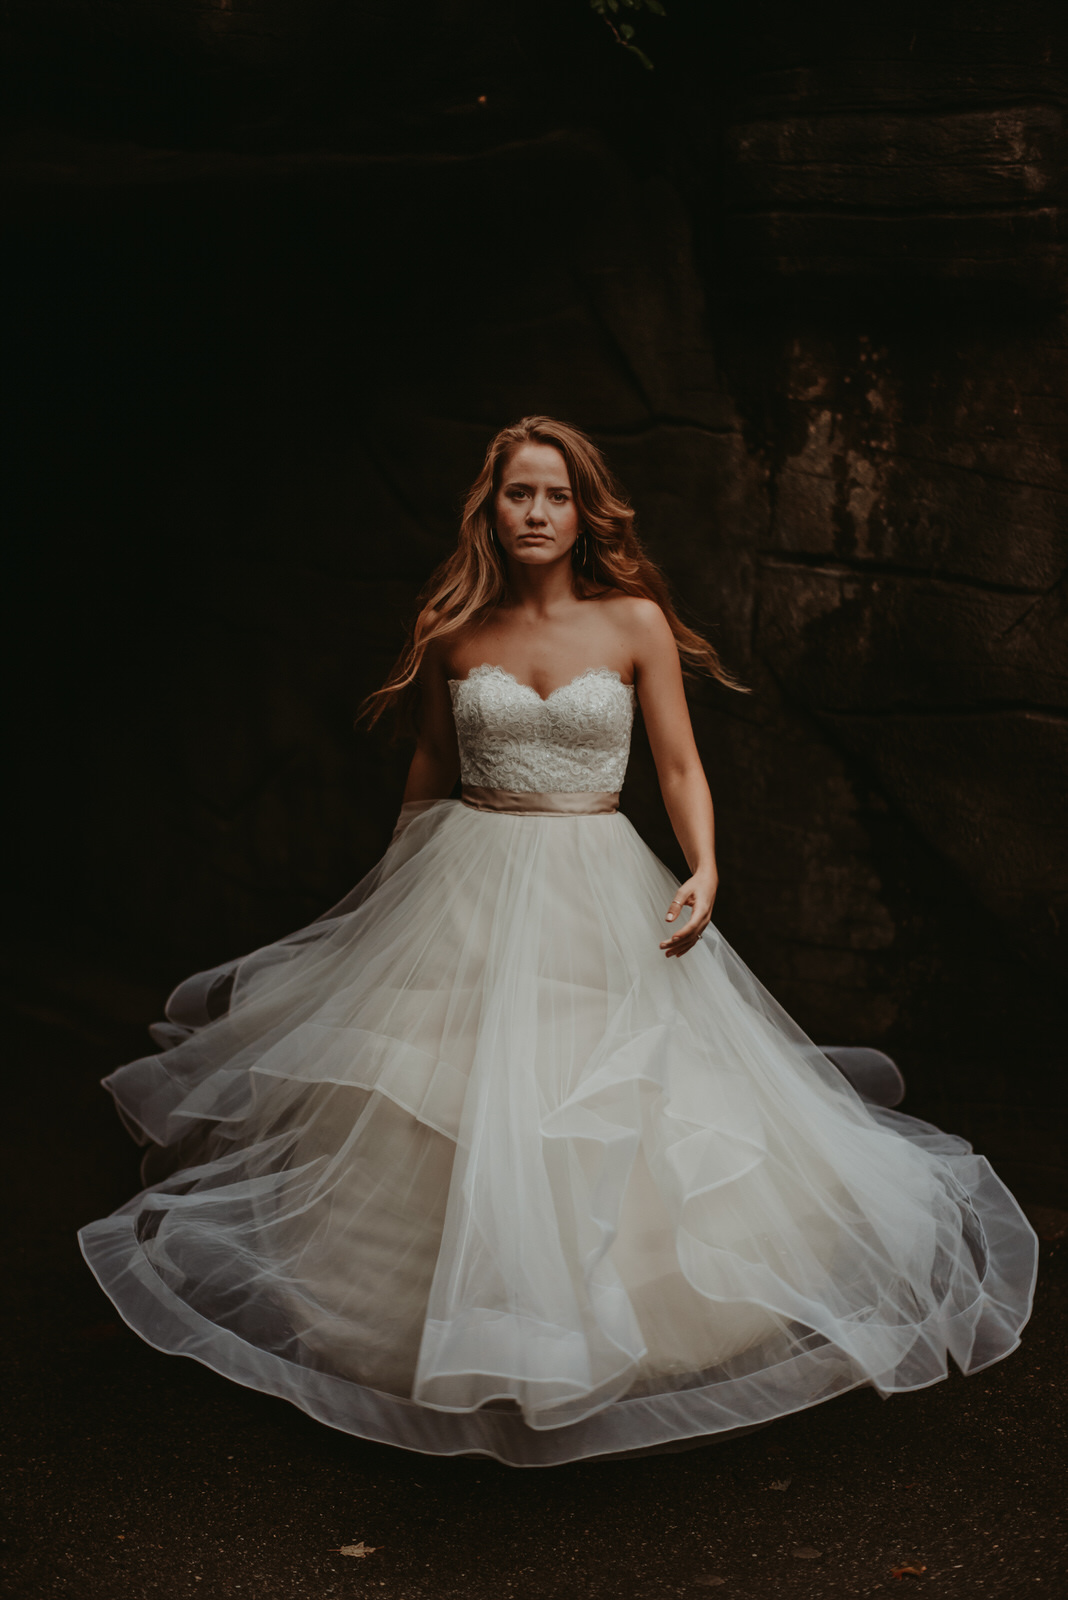 BHLDN destination wedding, moody photography, Chicago wedding photography - The Adamkovi